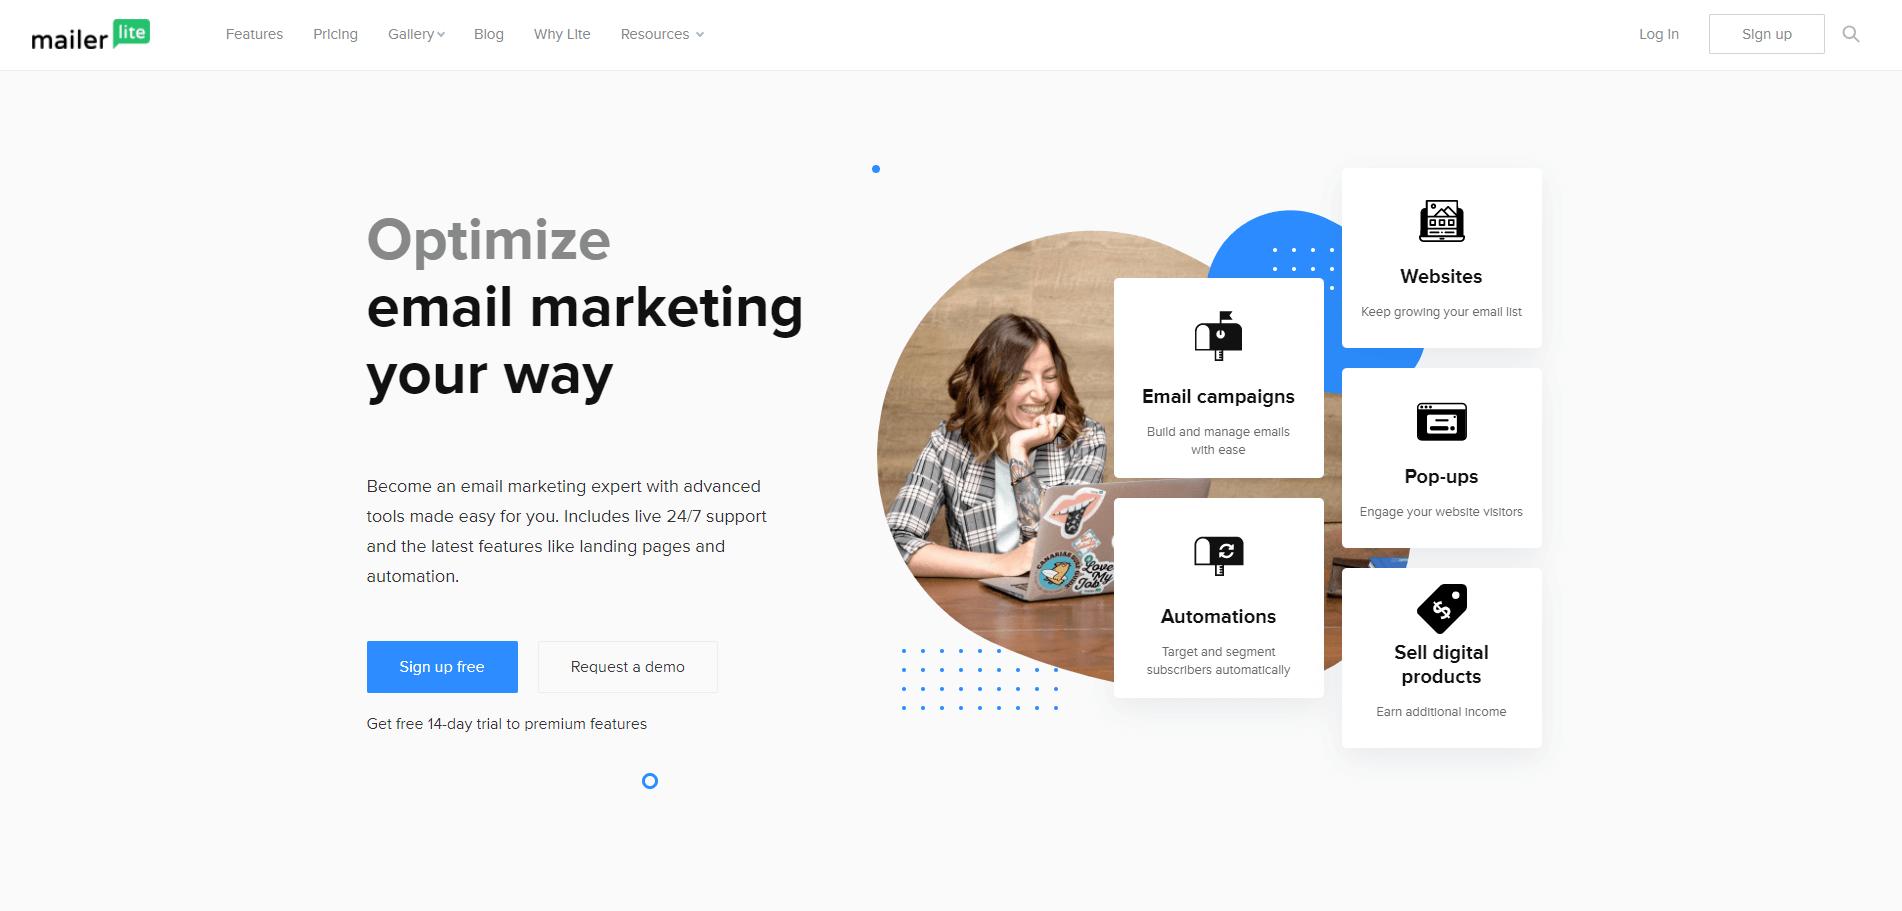 mailerlite home page